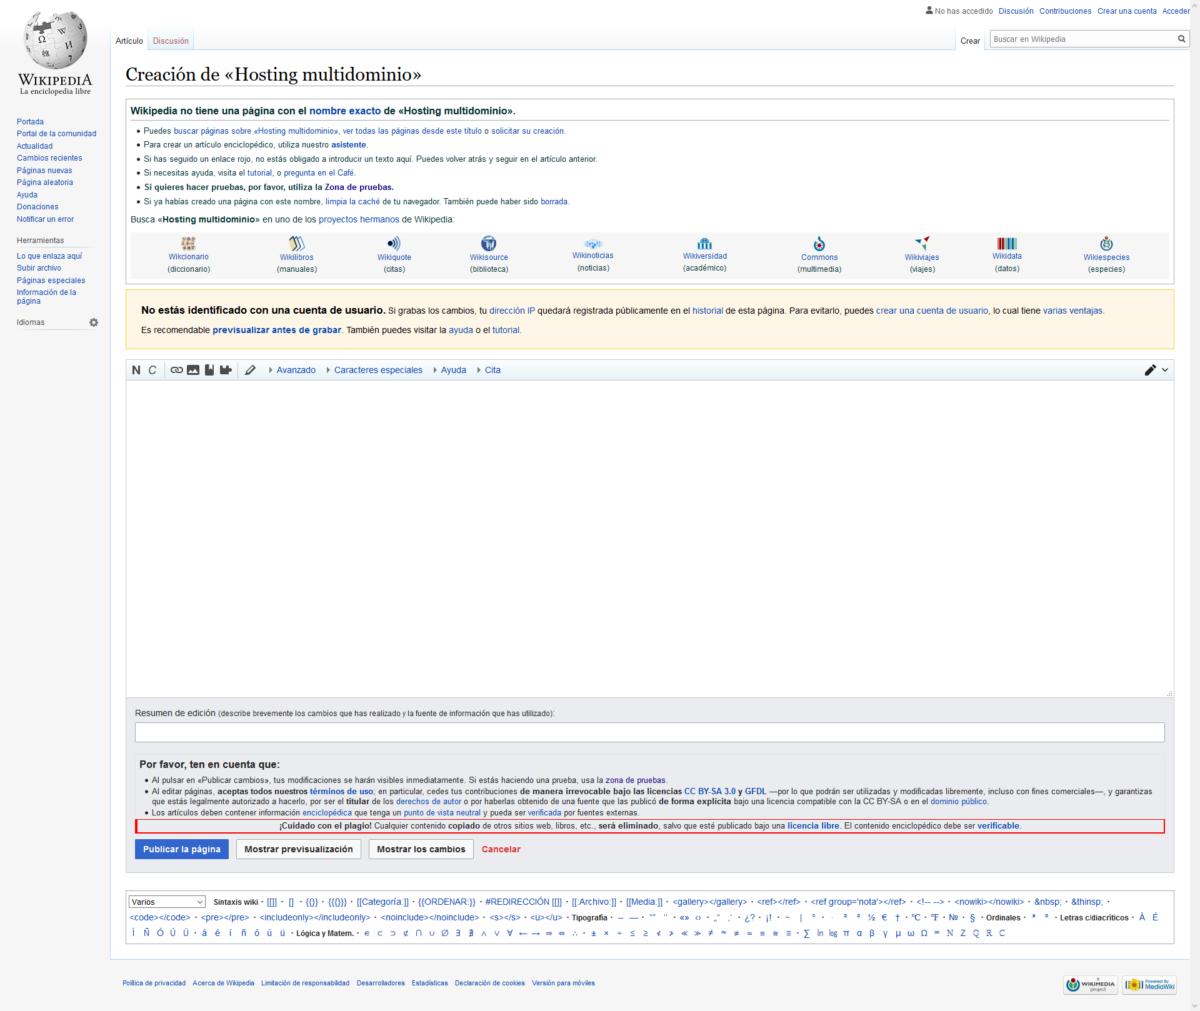 Pantalla de la página de hosting multidominio en Wikipedia